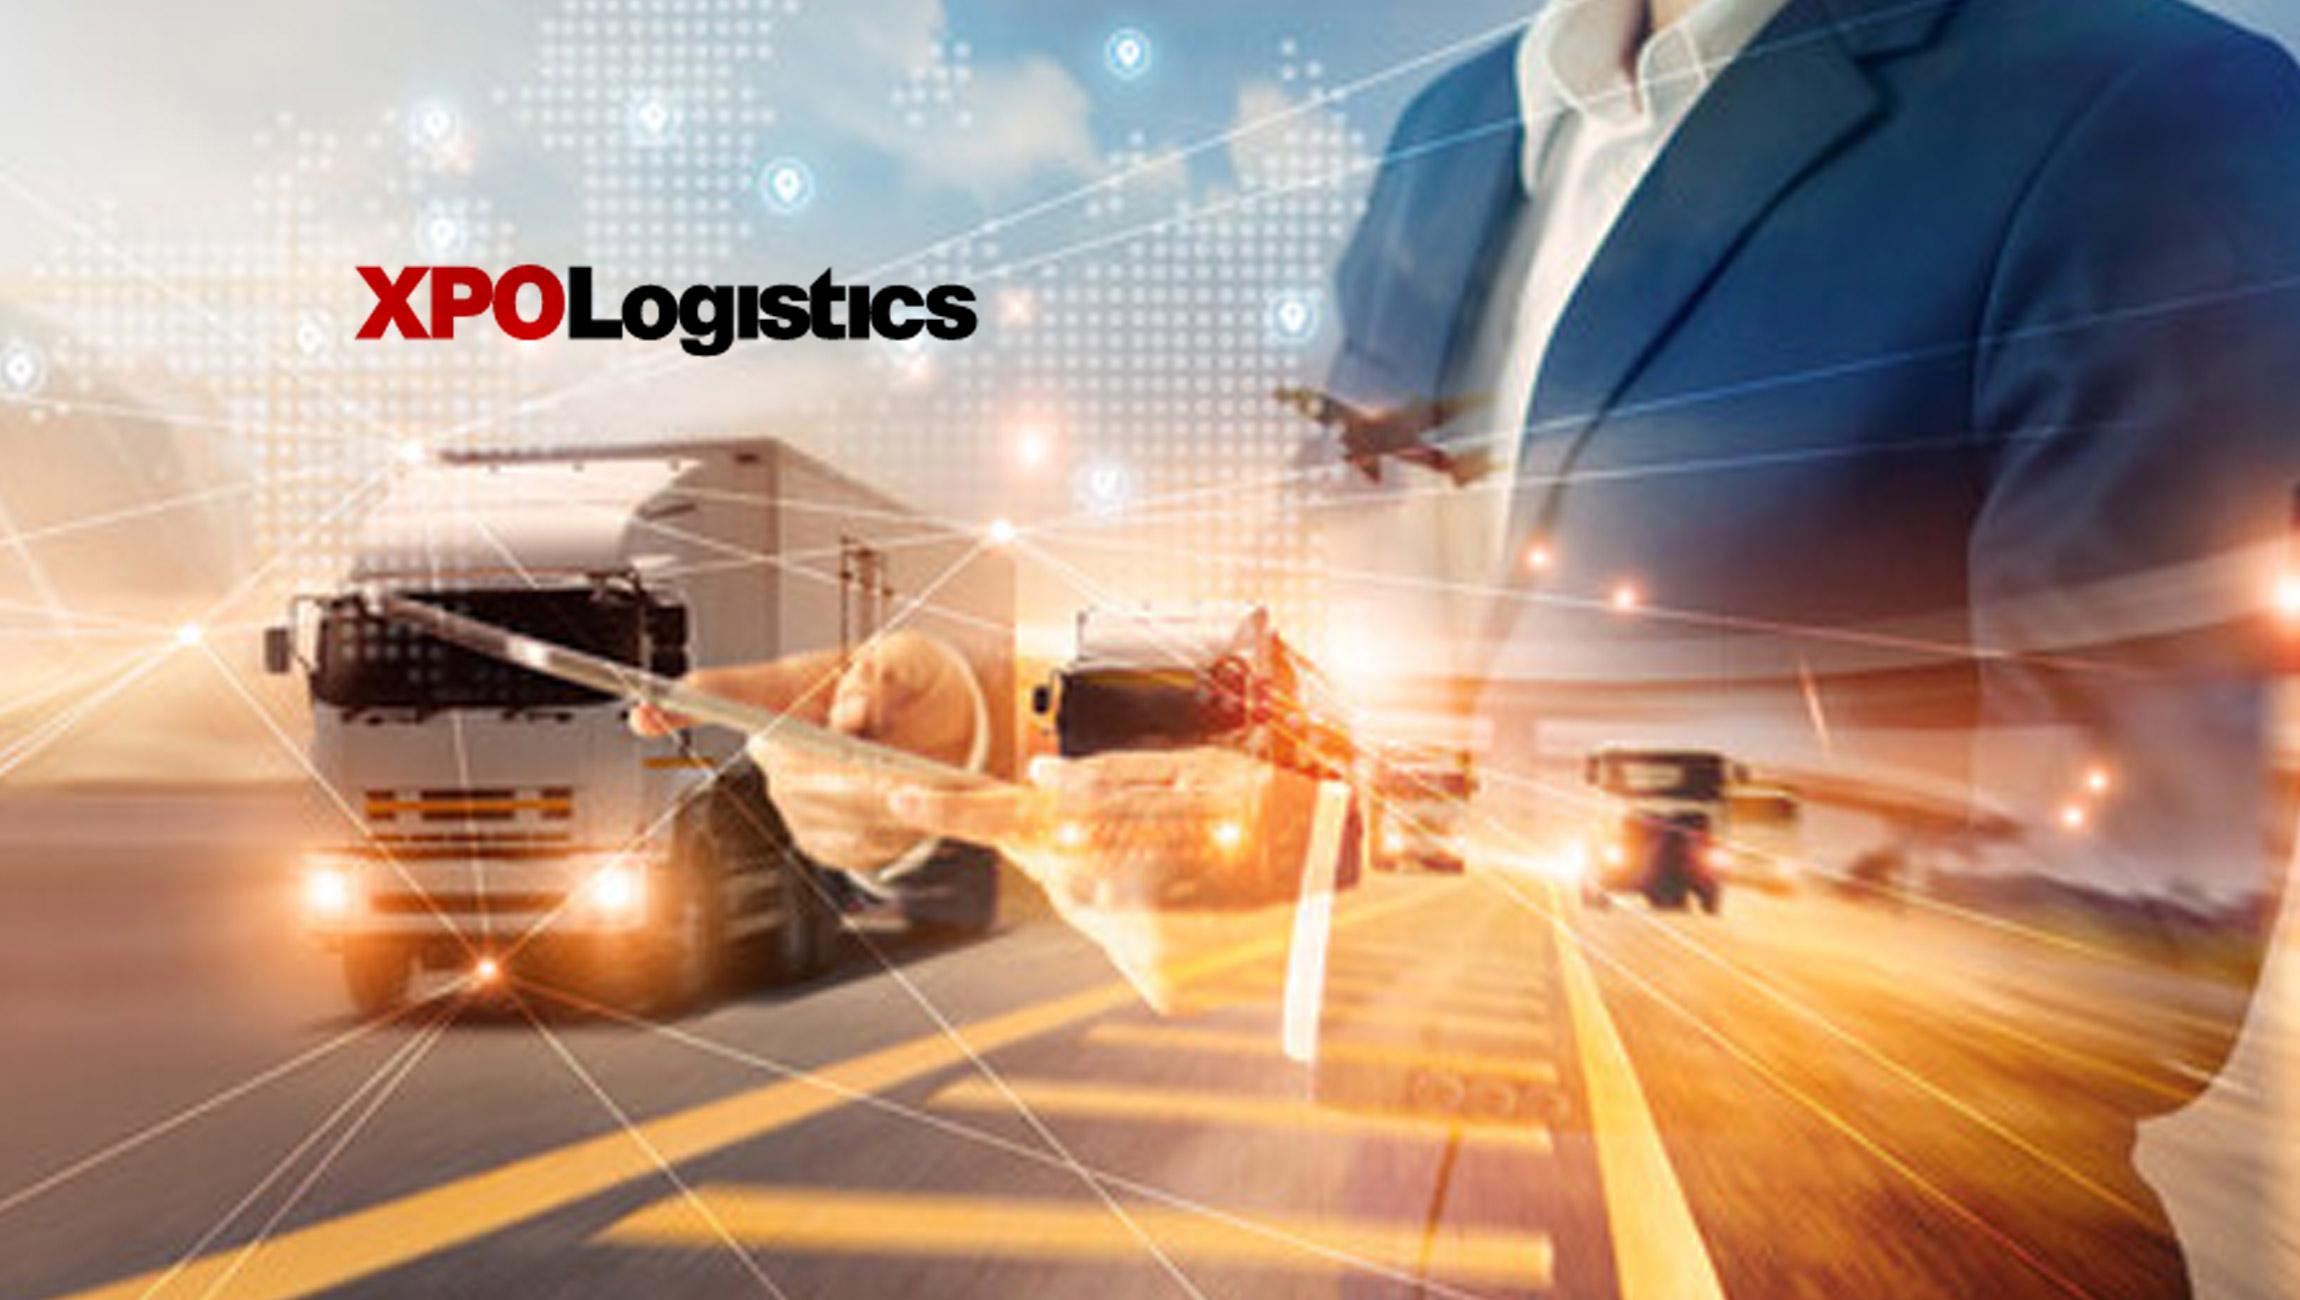 XPO-Logistics-Named-a-Leader-in-the-Gartner-Magic-Quadrant-for-Third-Party-Logistics_-North-America